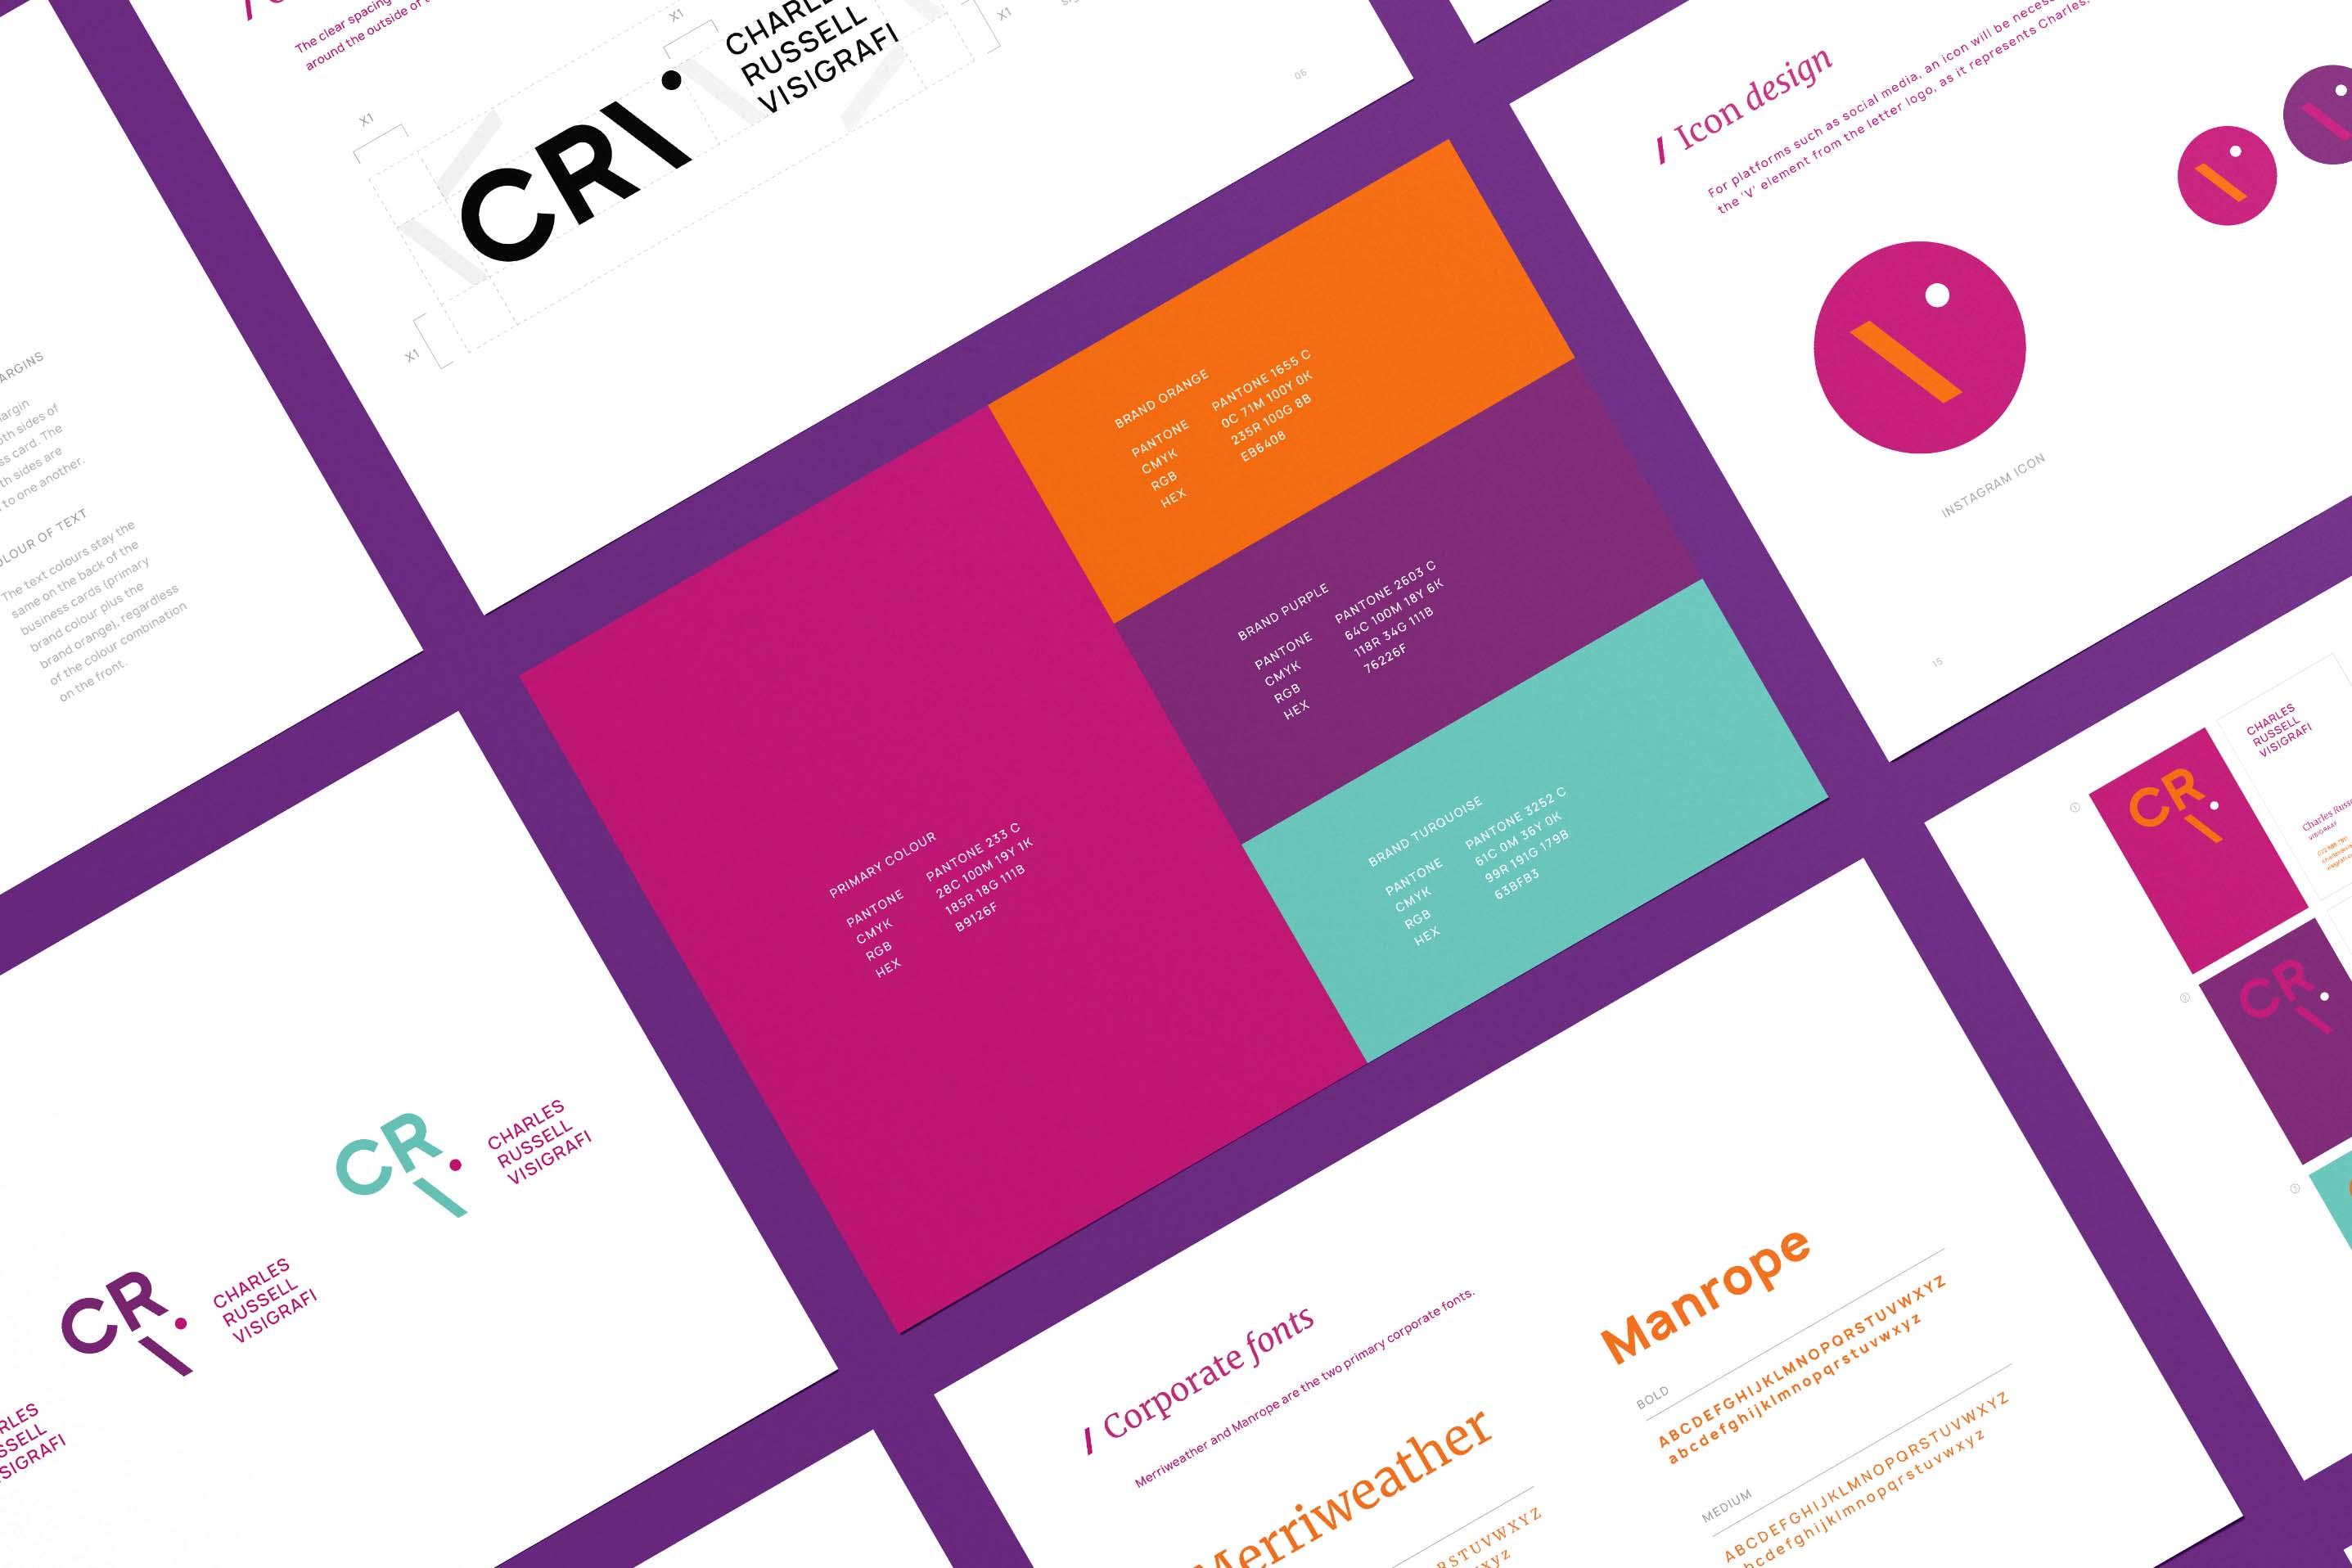 Creative Caterpillar client Charles Russell Visigrafi brand manual.